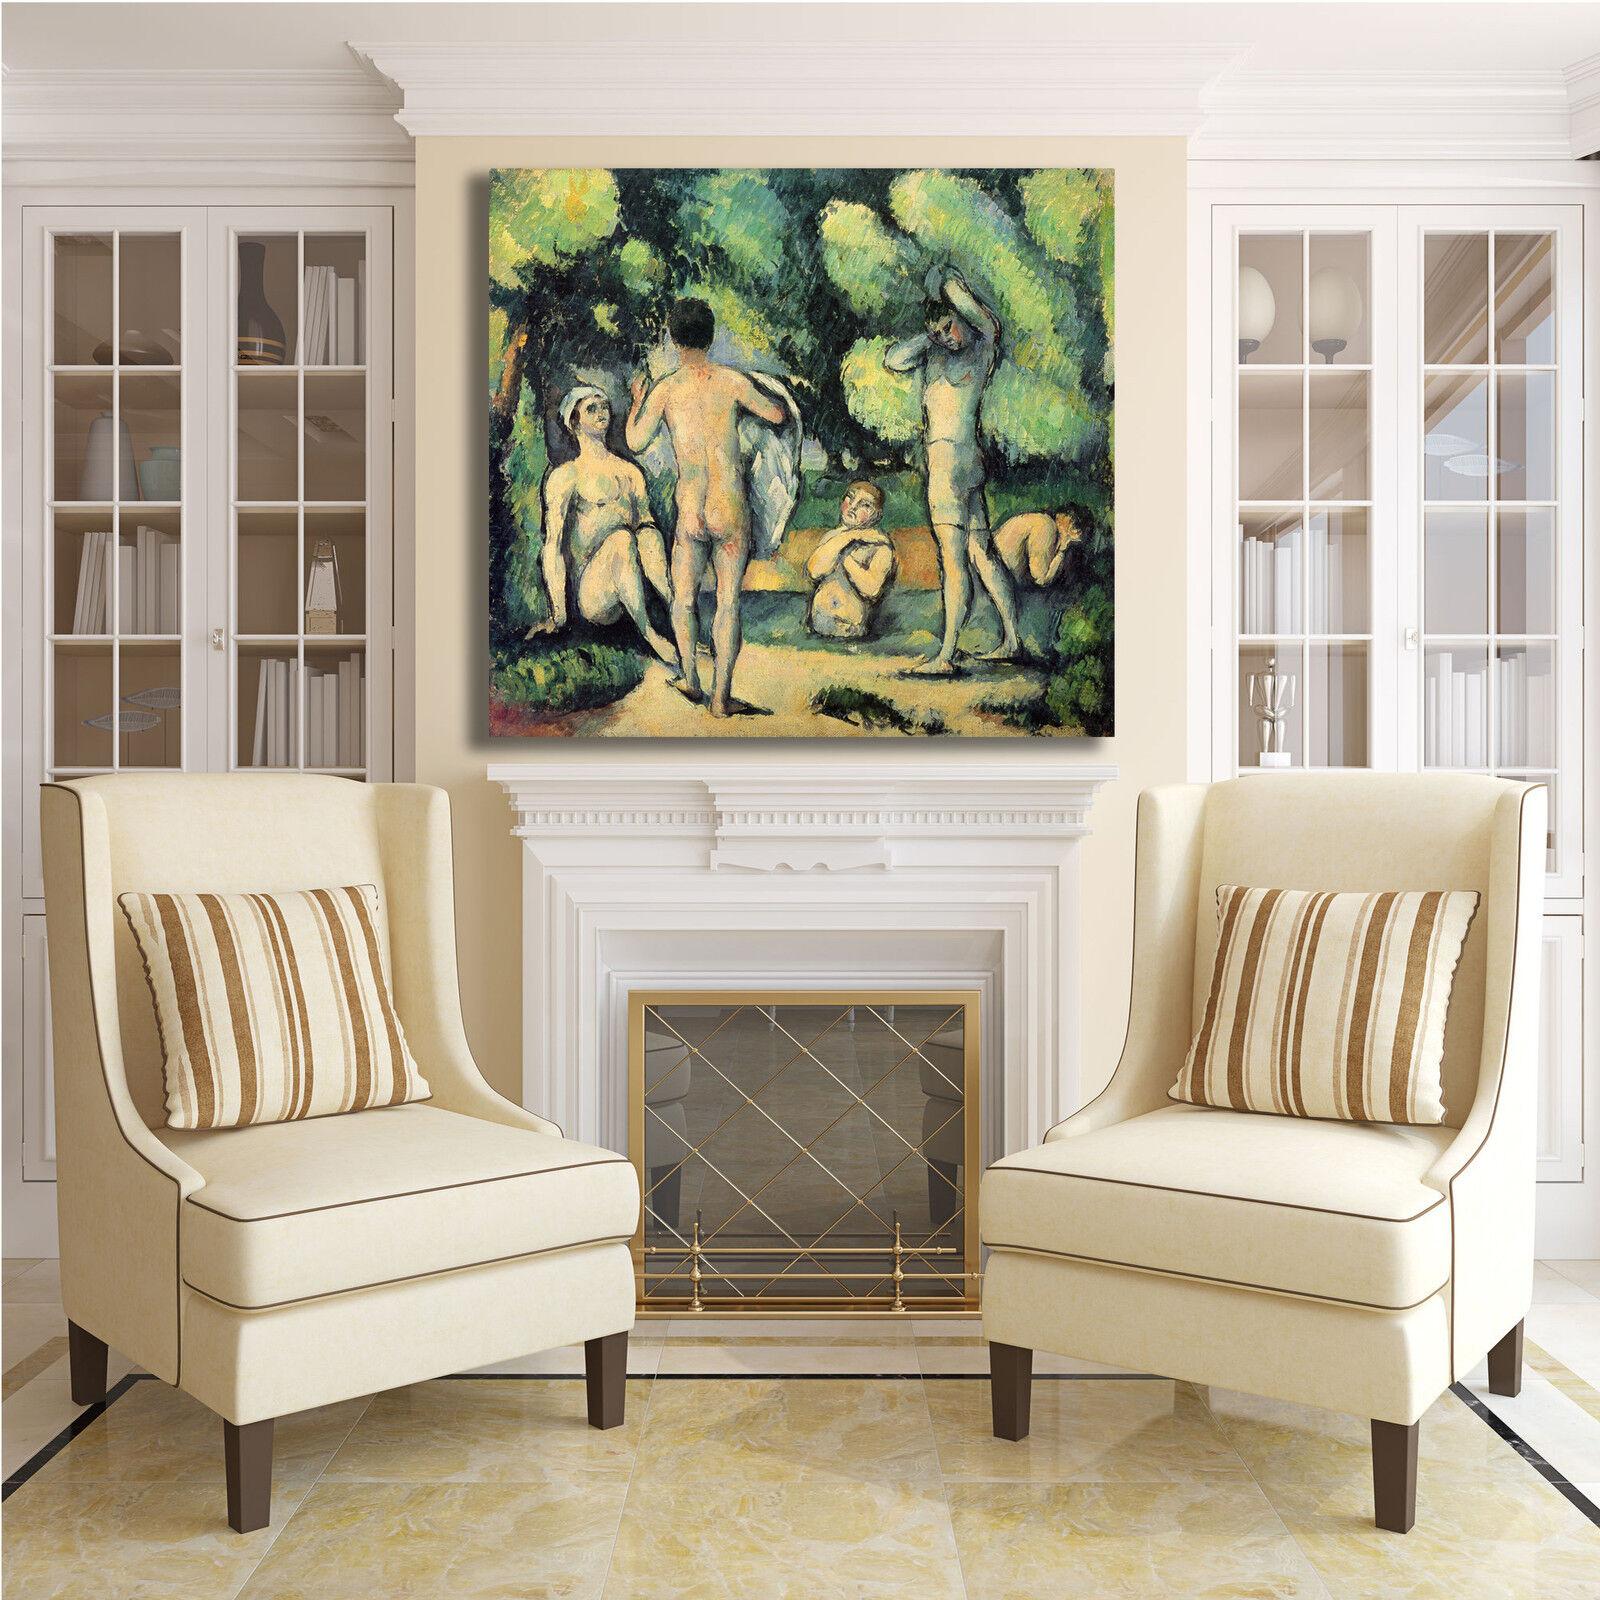 Cezanne Cezanne Cezanne bagnanti 8 design quadro stampa tela dipinto con telaio arRouge o casa b95b9c